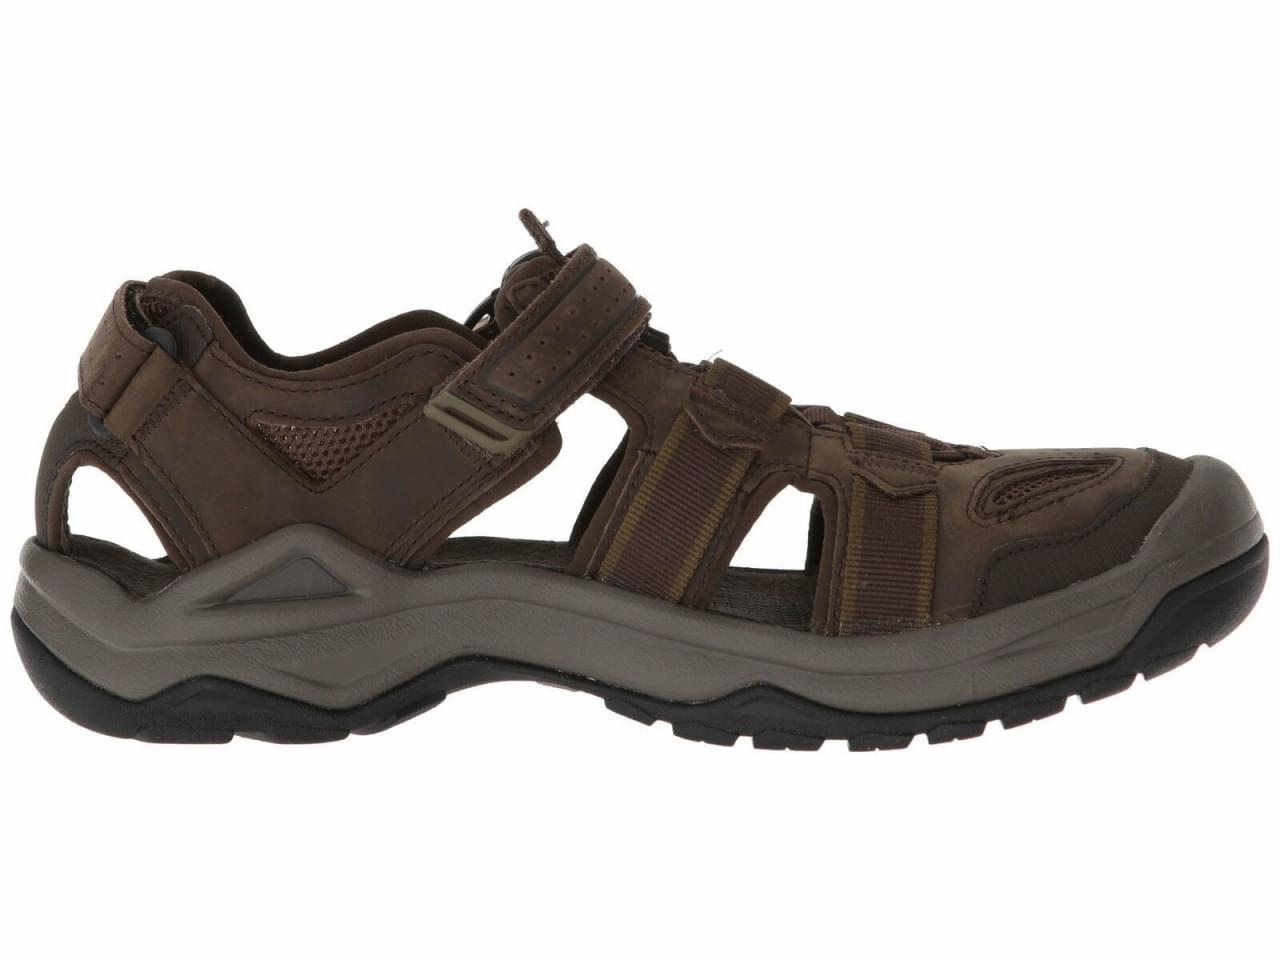 Teva Omnium 2 Leather Sandaal Heren